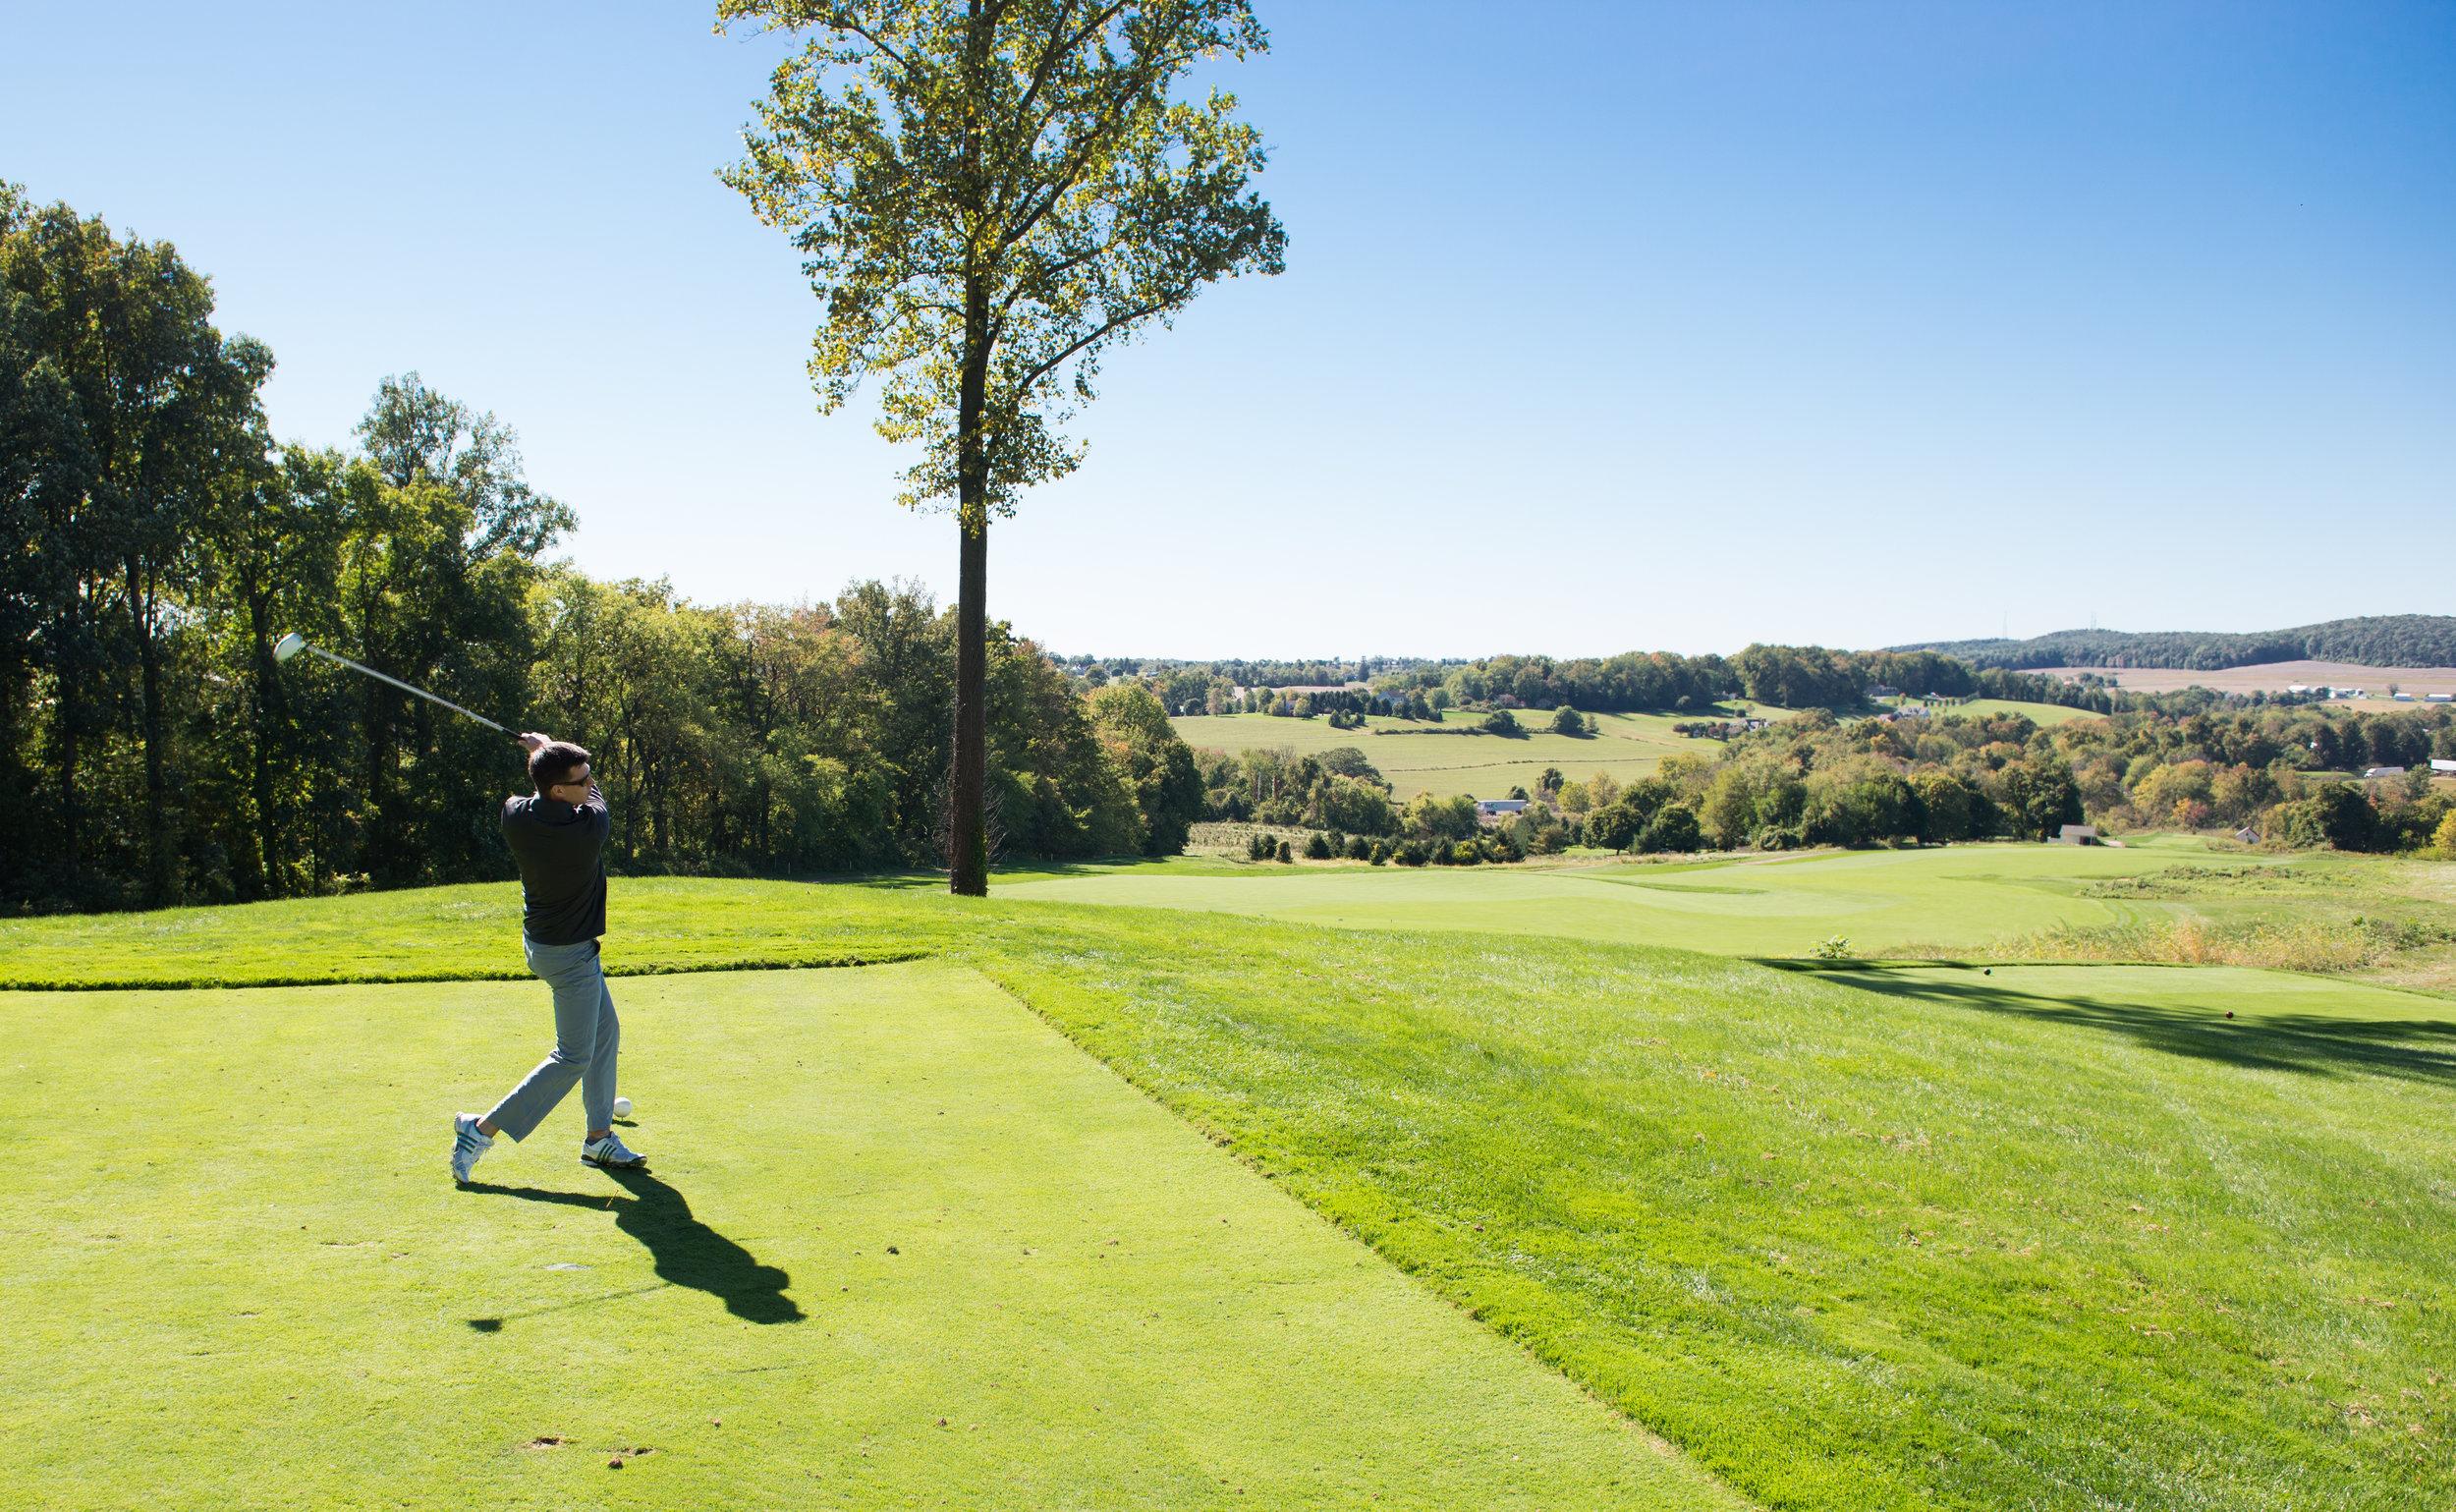 Golf_2016_33.jpg